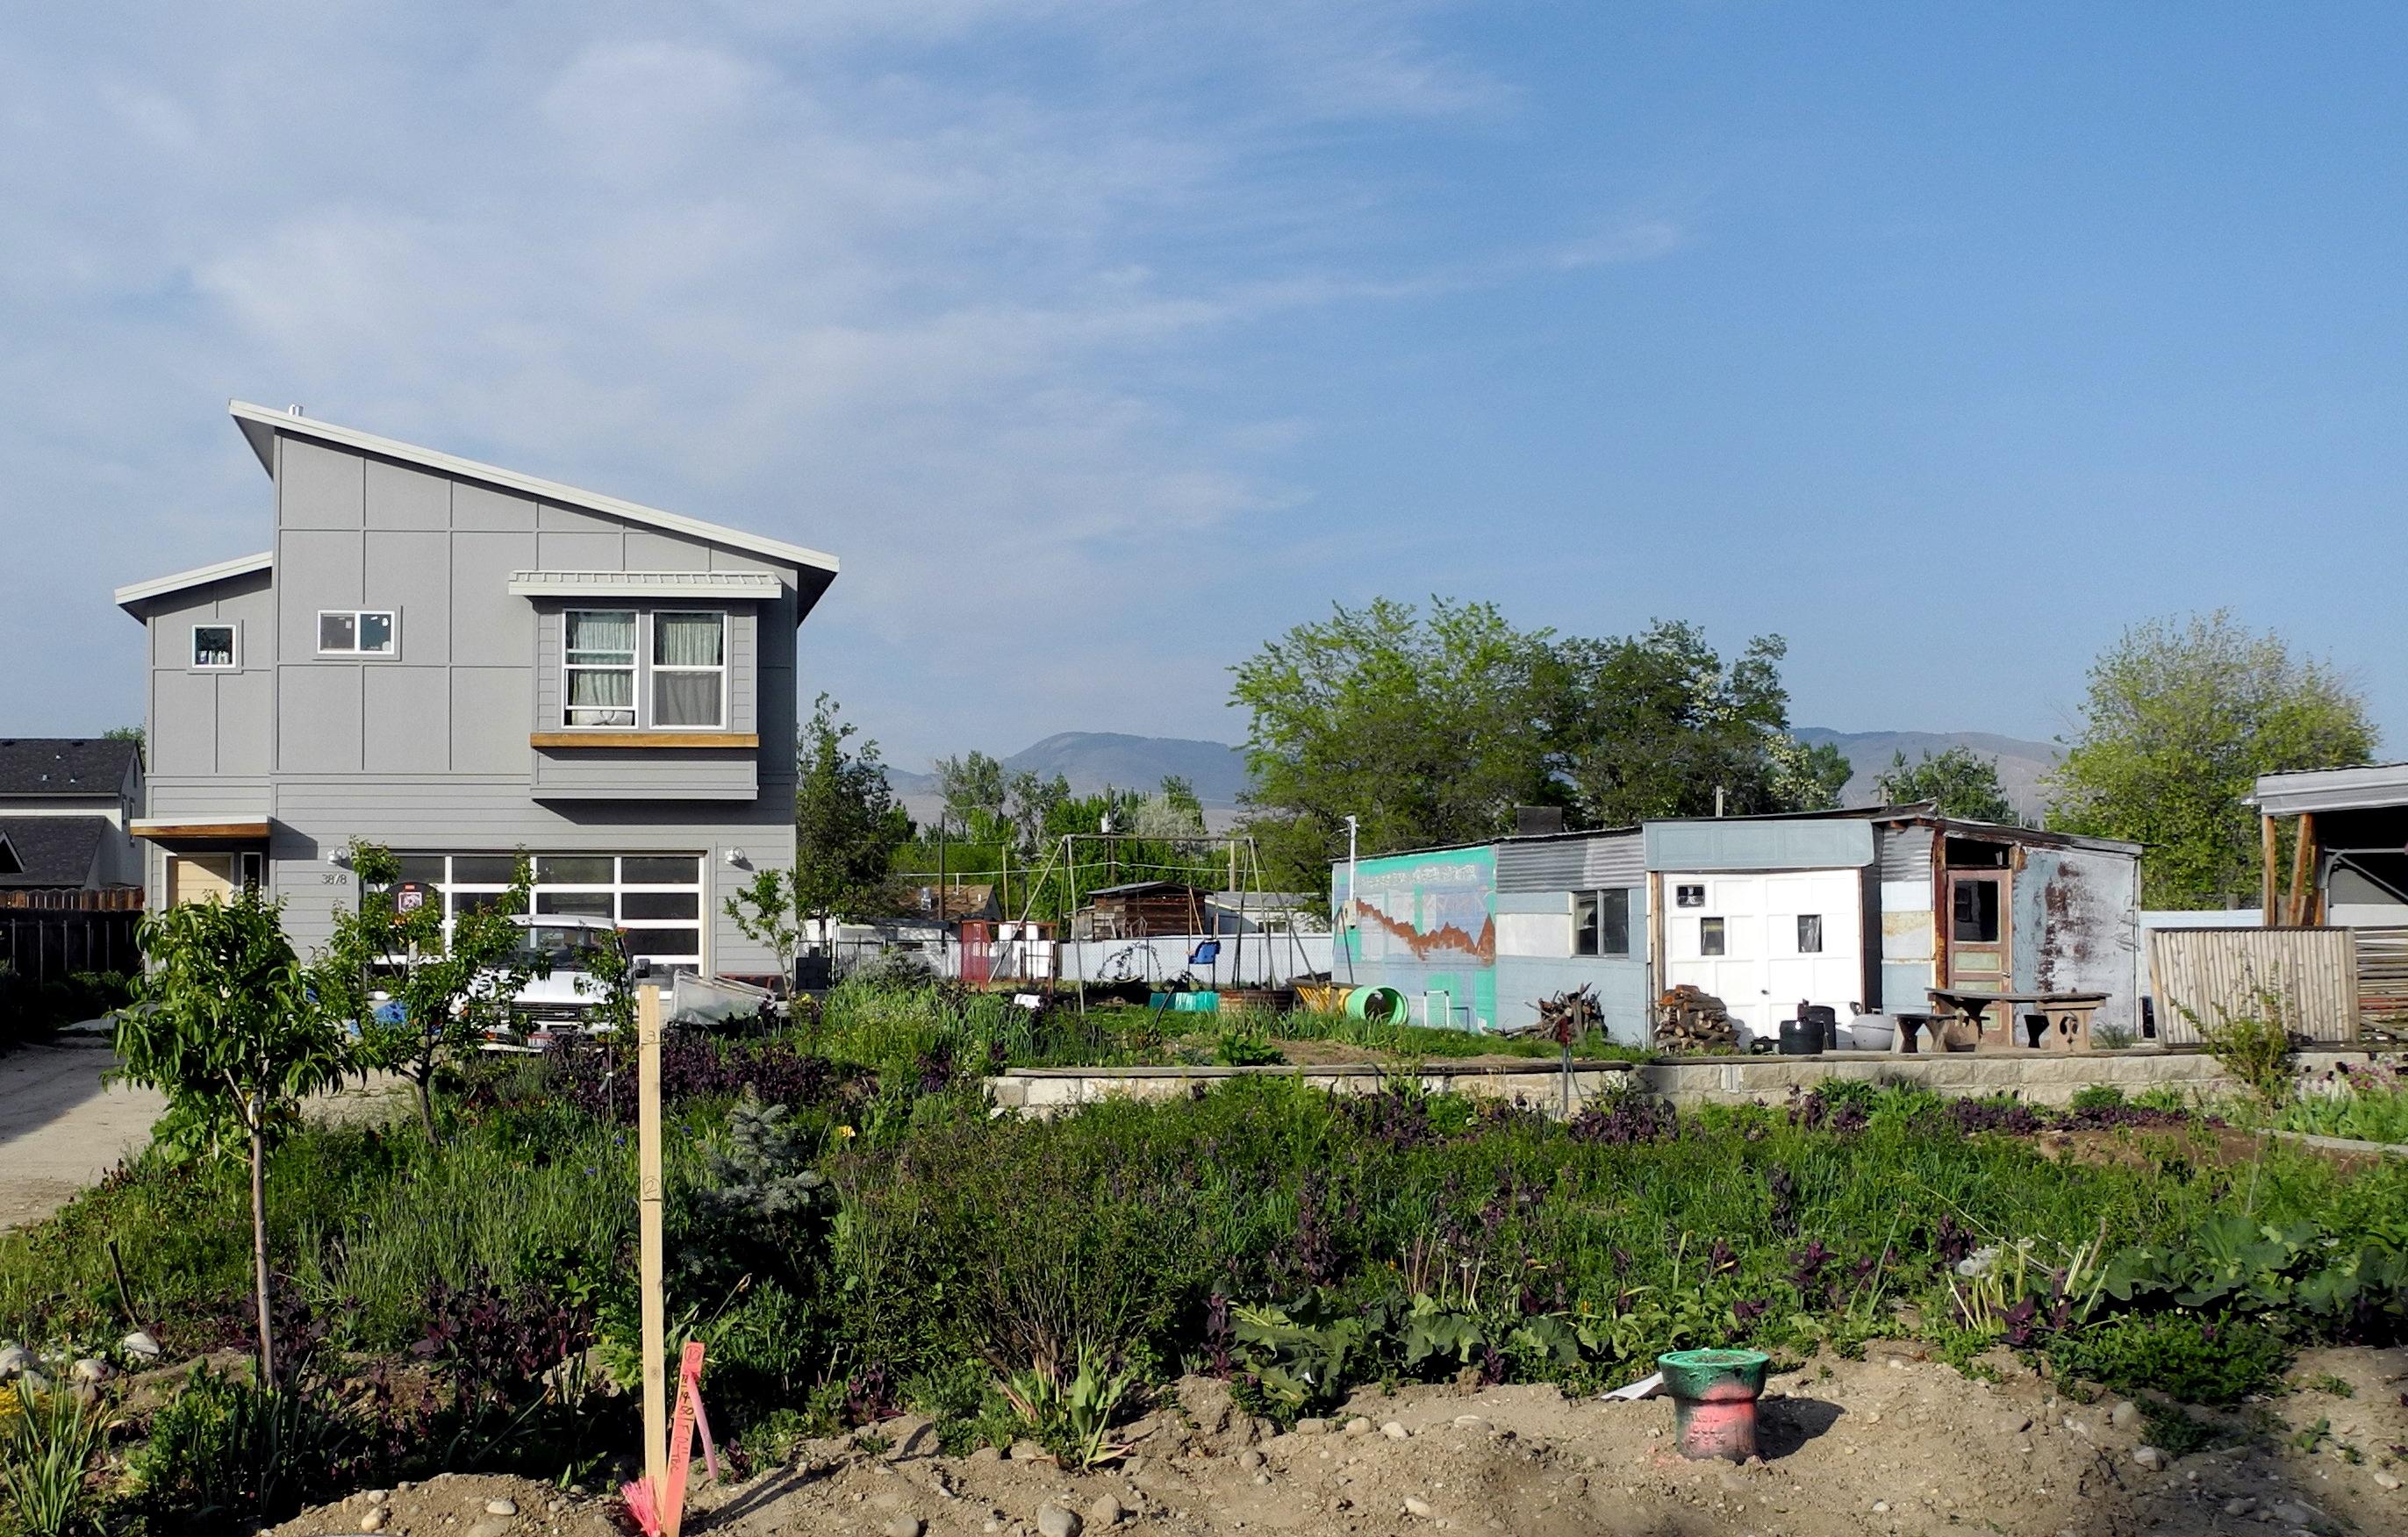 Growing Garden City Boise State Public Radio